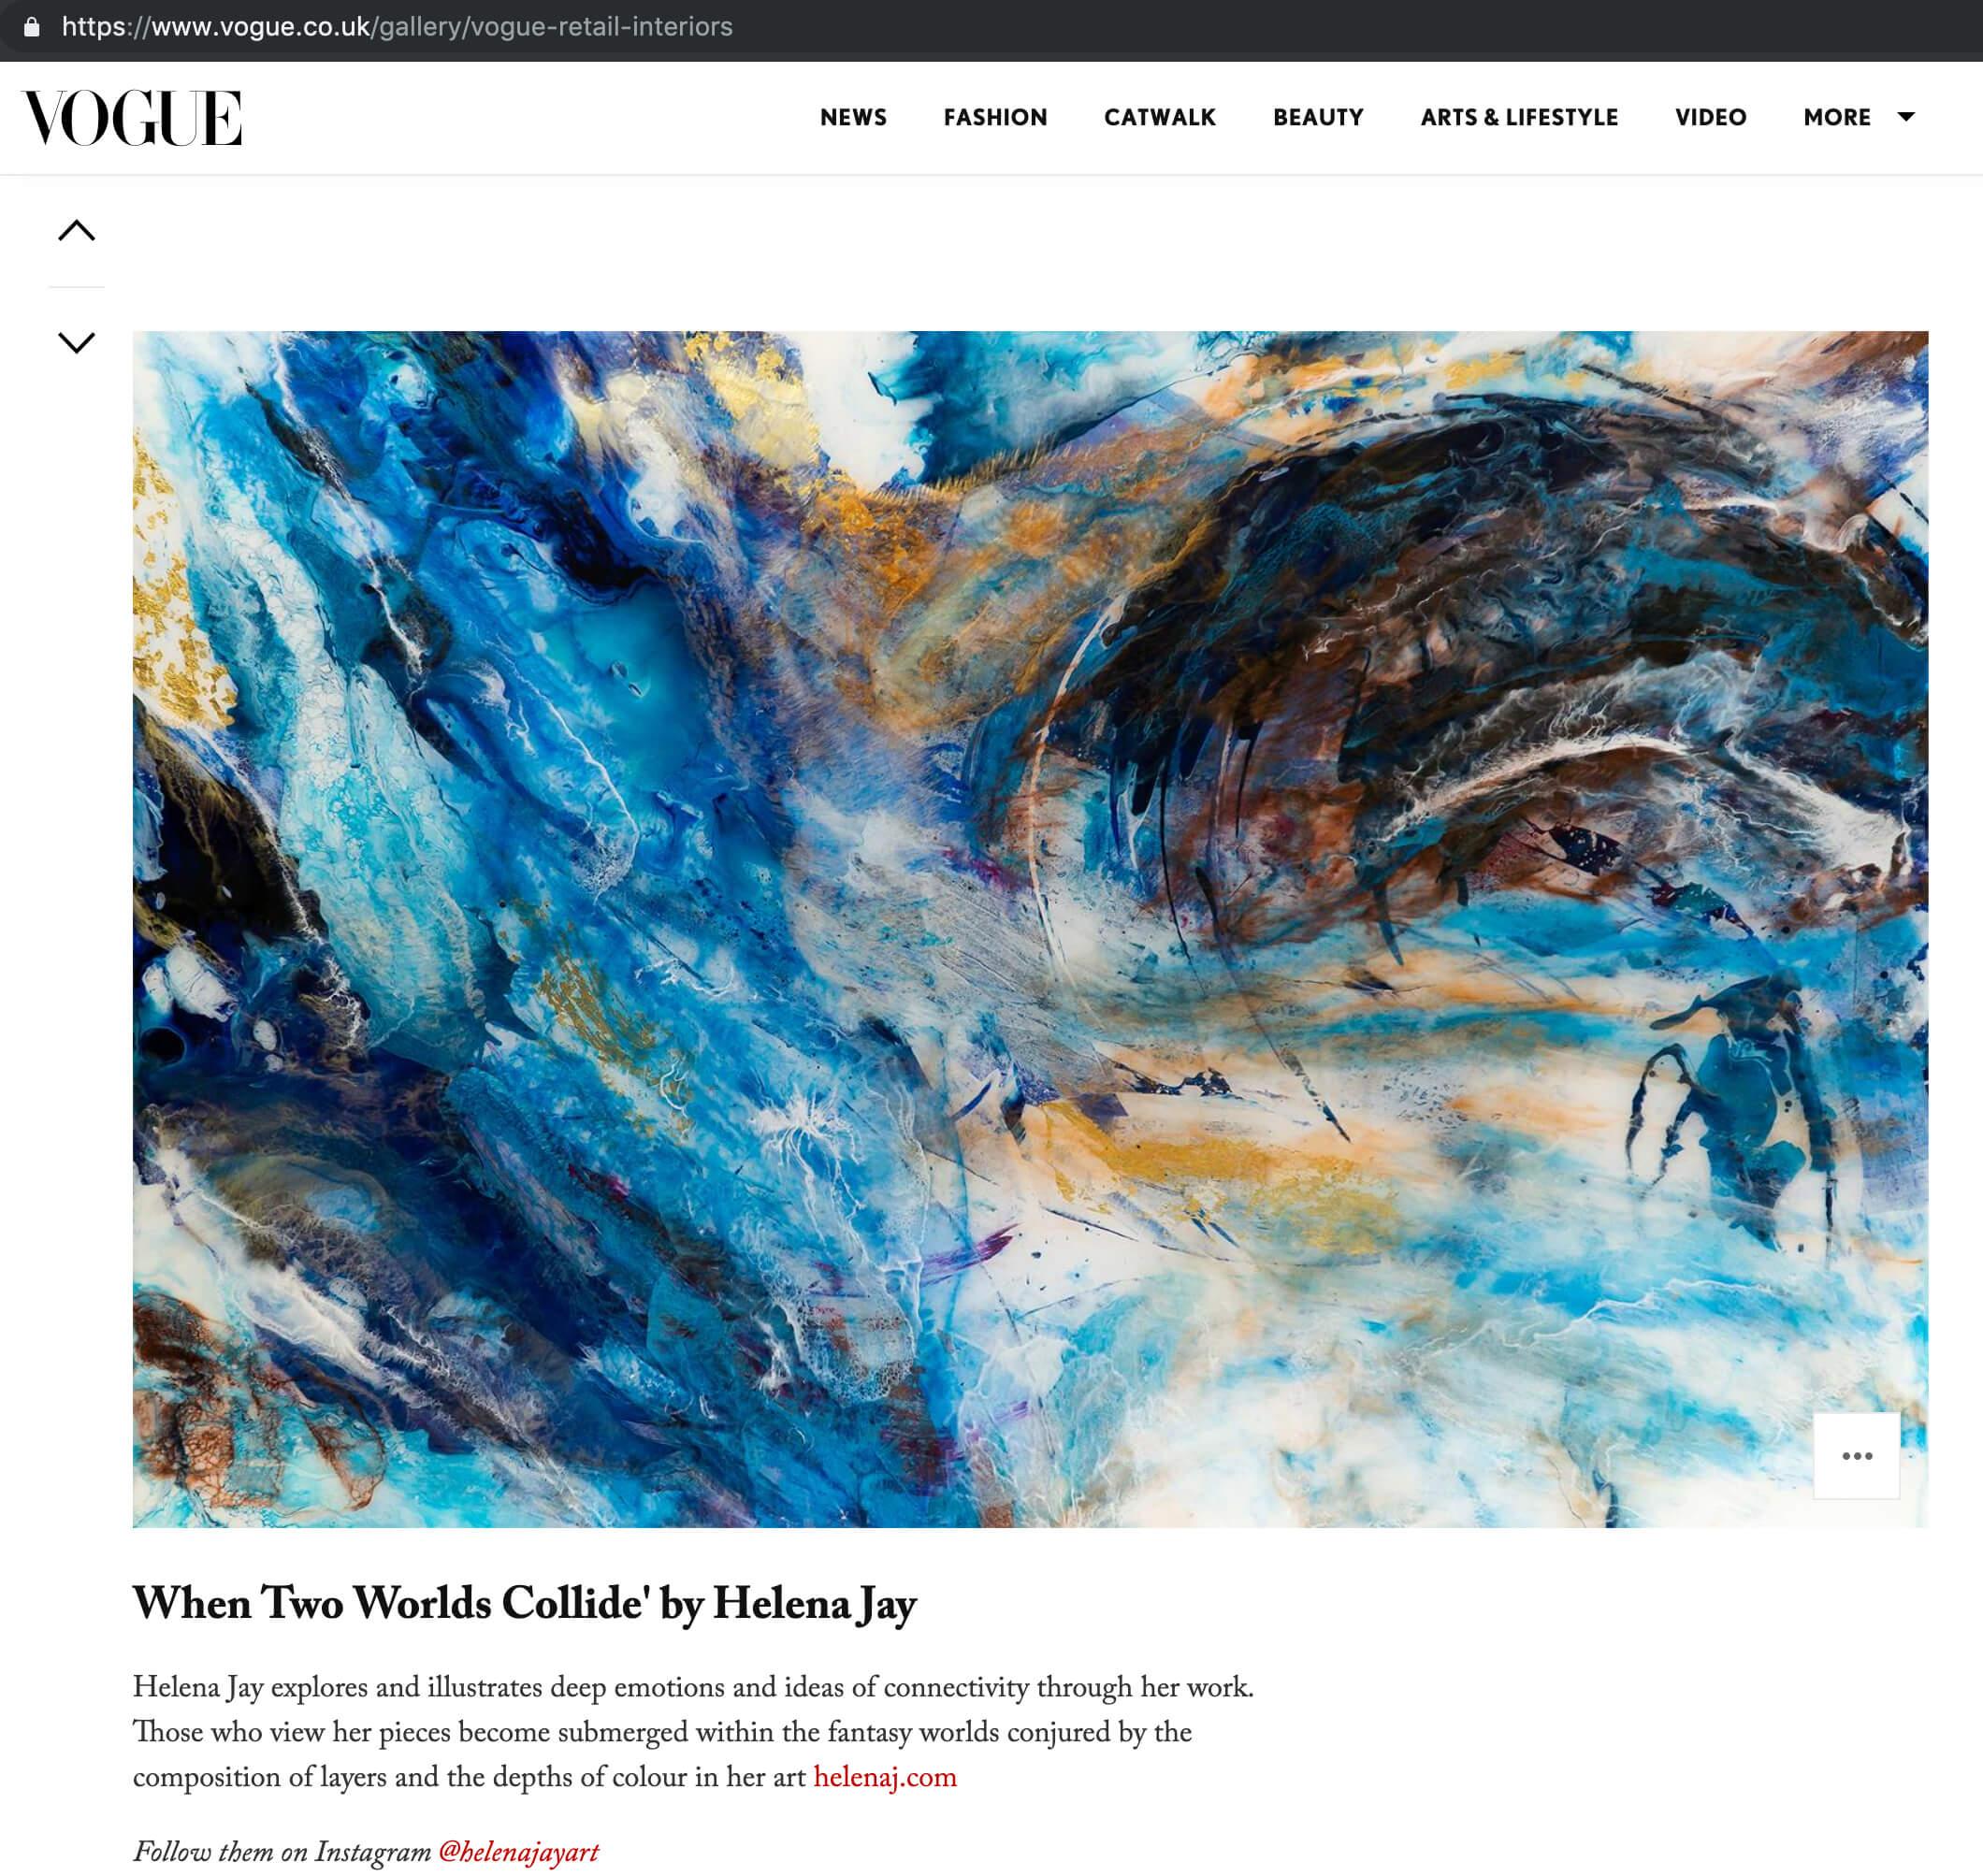 helena_jay_art_Vogue_june.jpg